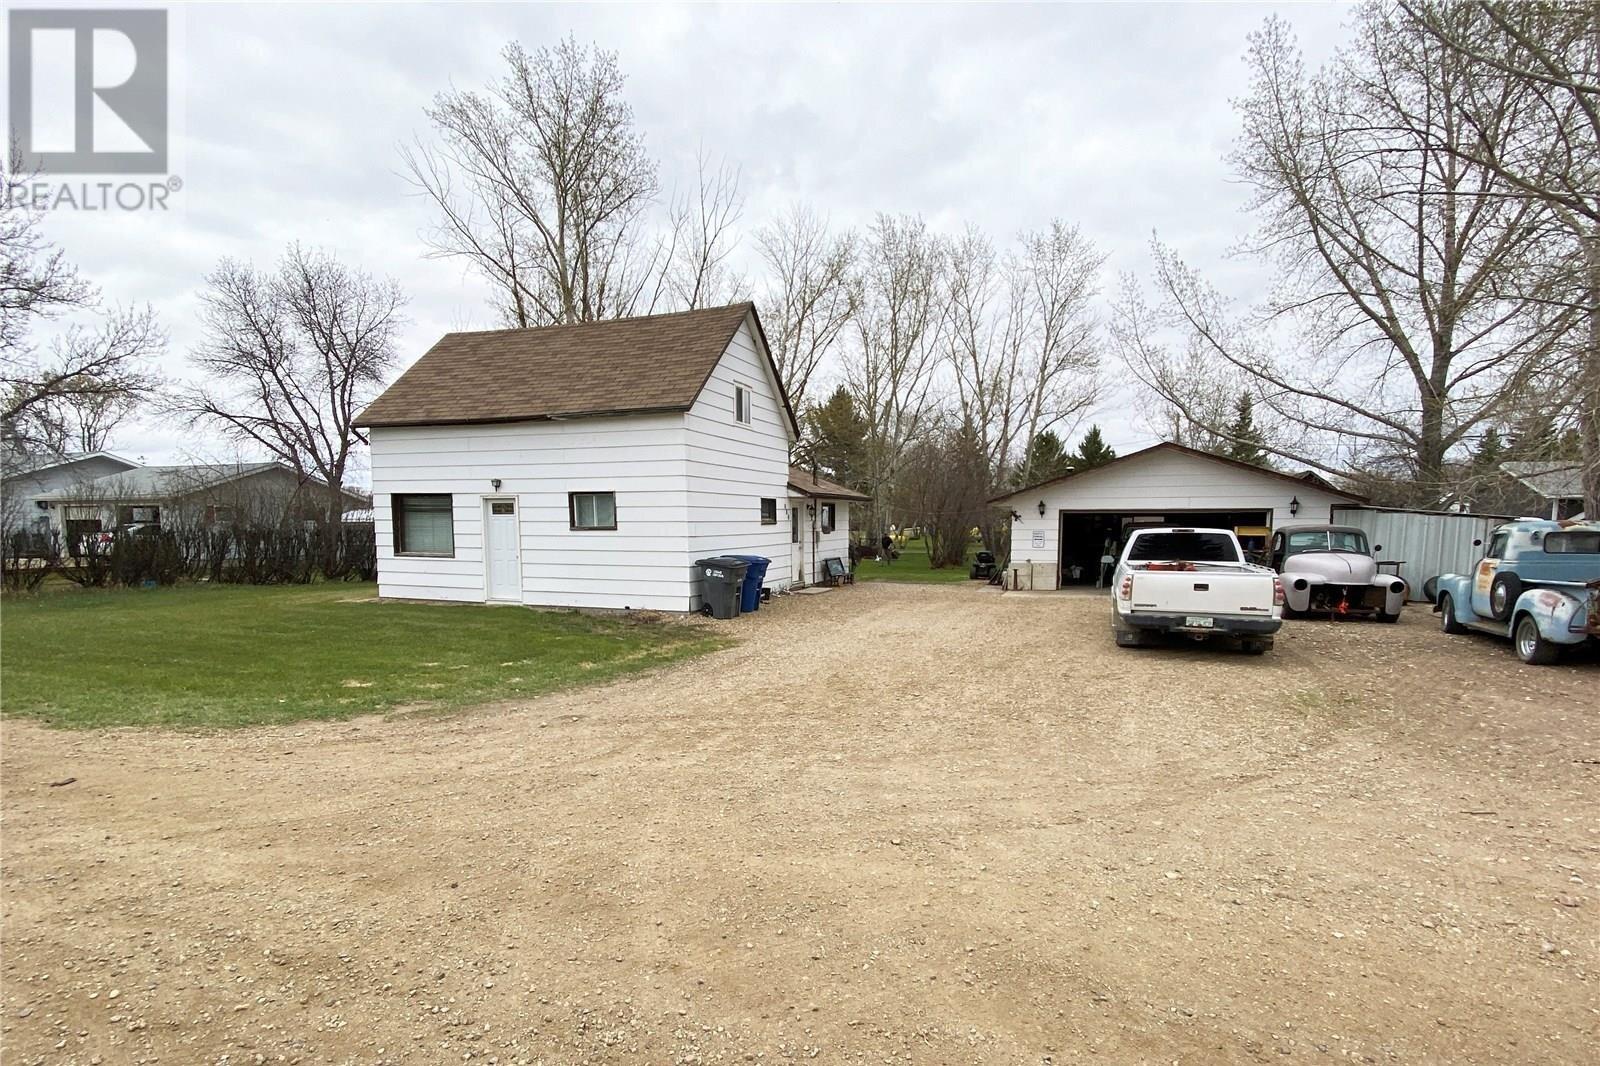 House for sale at 430 Macdonald Ave Craik Saskatchewan - MLS: SK833632